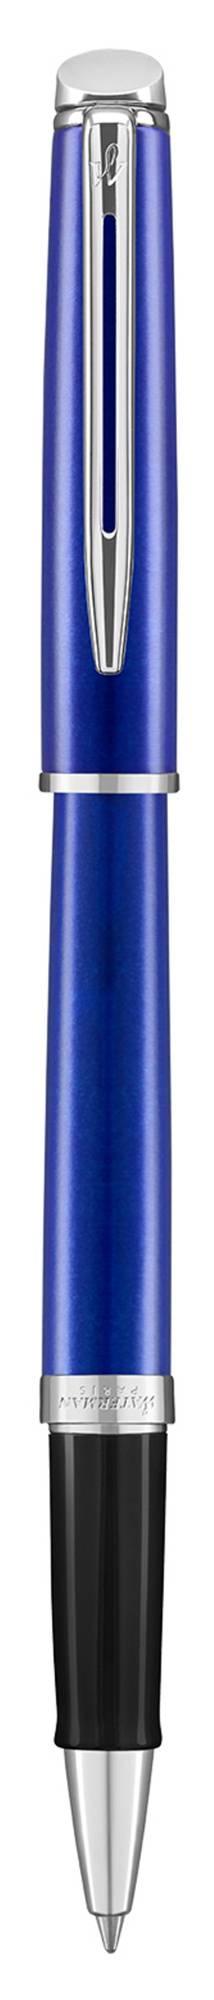 Ручка роллер Waterman Hemisphere Bright Blue CT (2042969) - фото 1